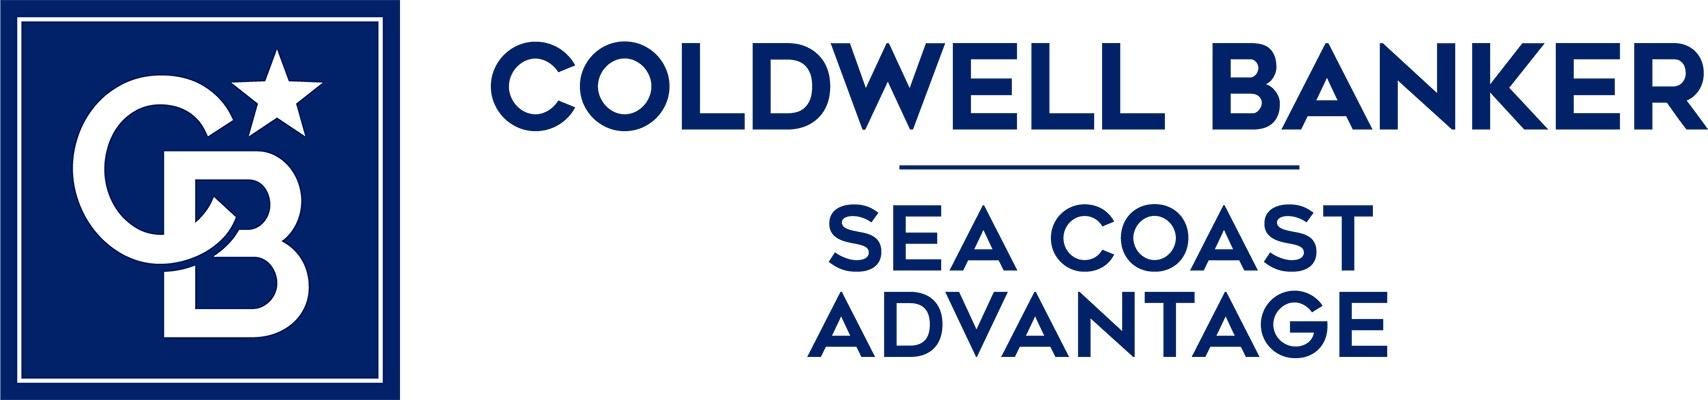 Tammy Barnes - Coldwell Banker Sea Coast Advantage Realty Logo